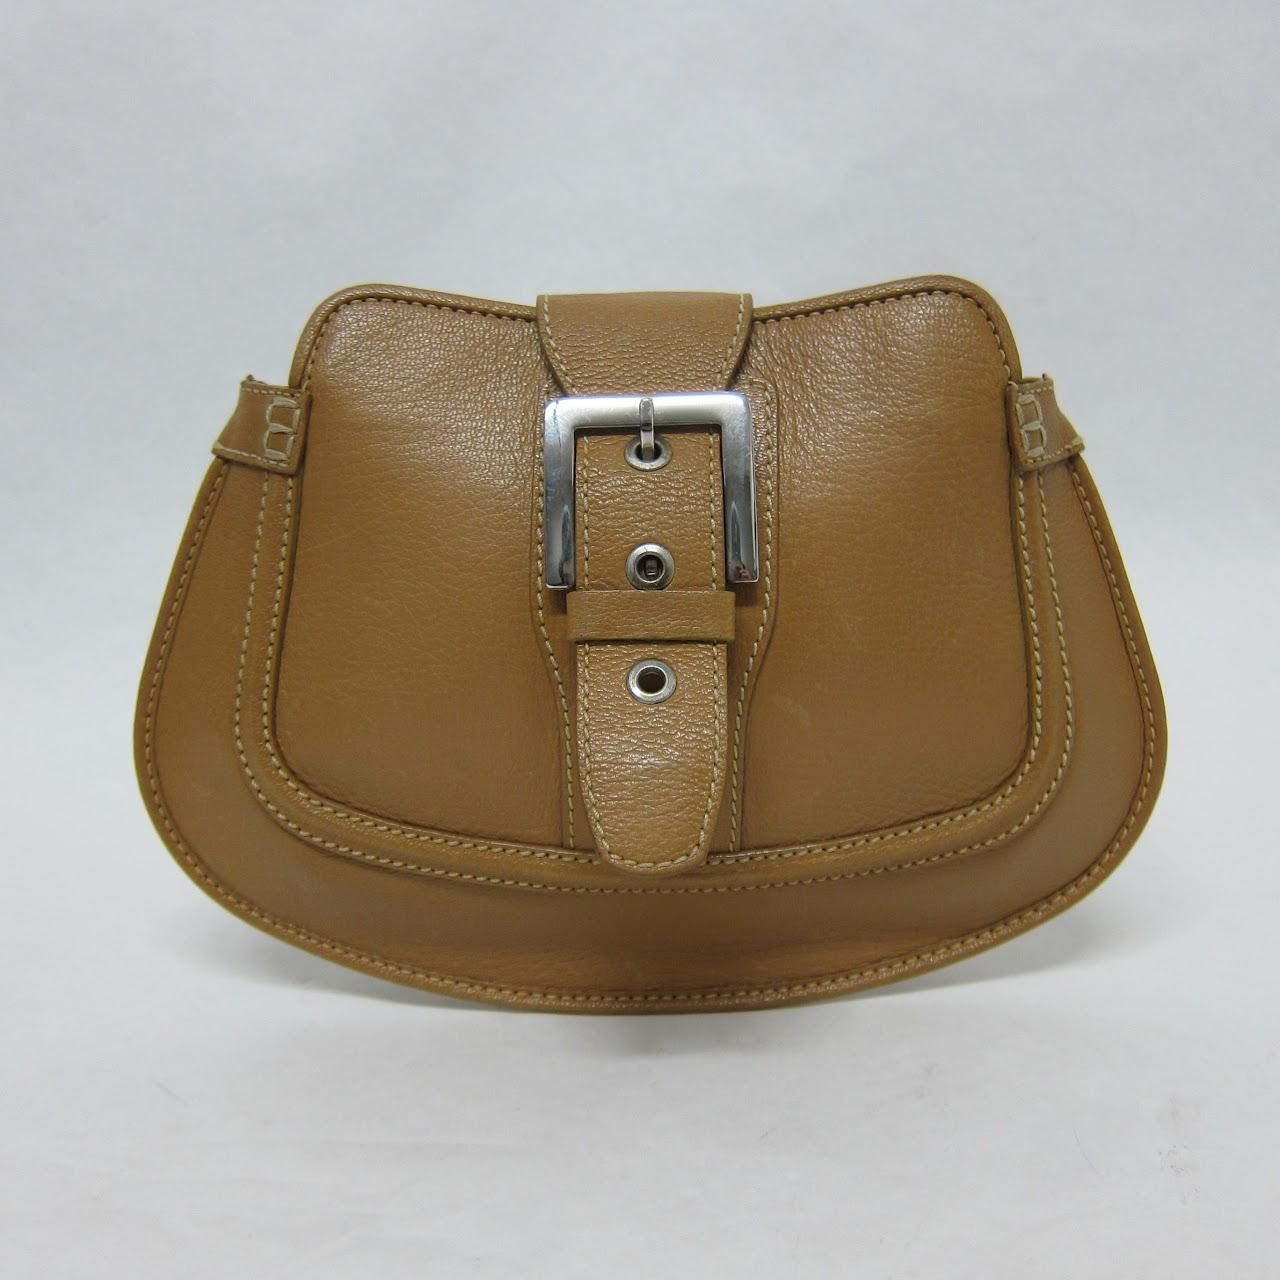 7f69bf31bed56 Tods Camel Leather Handbag